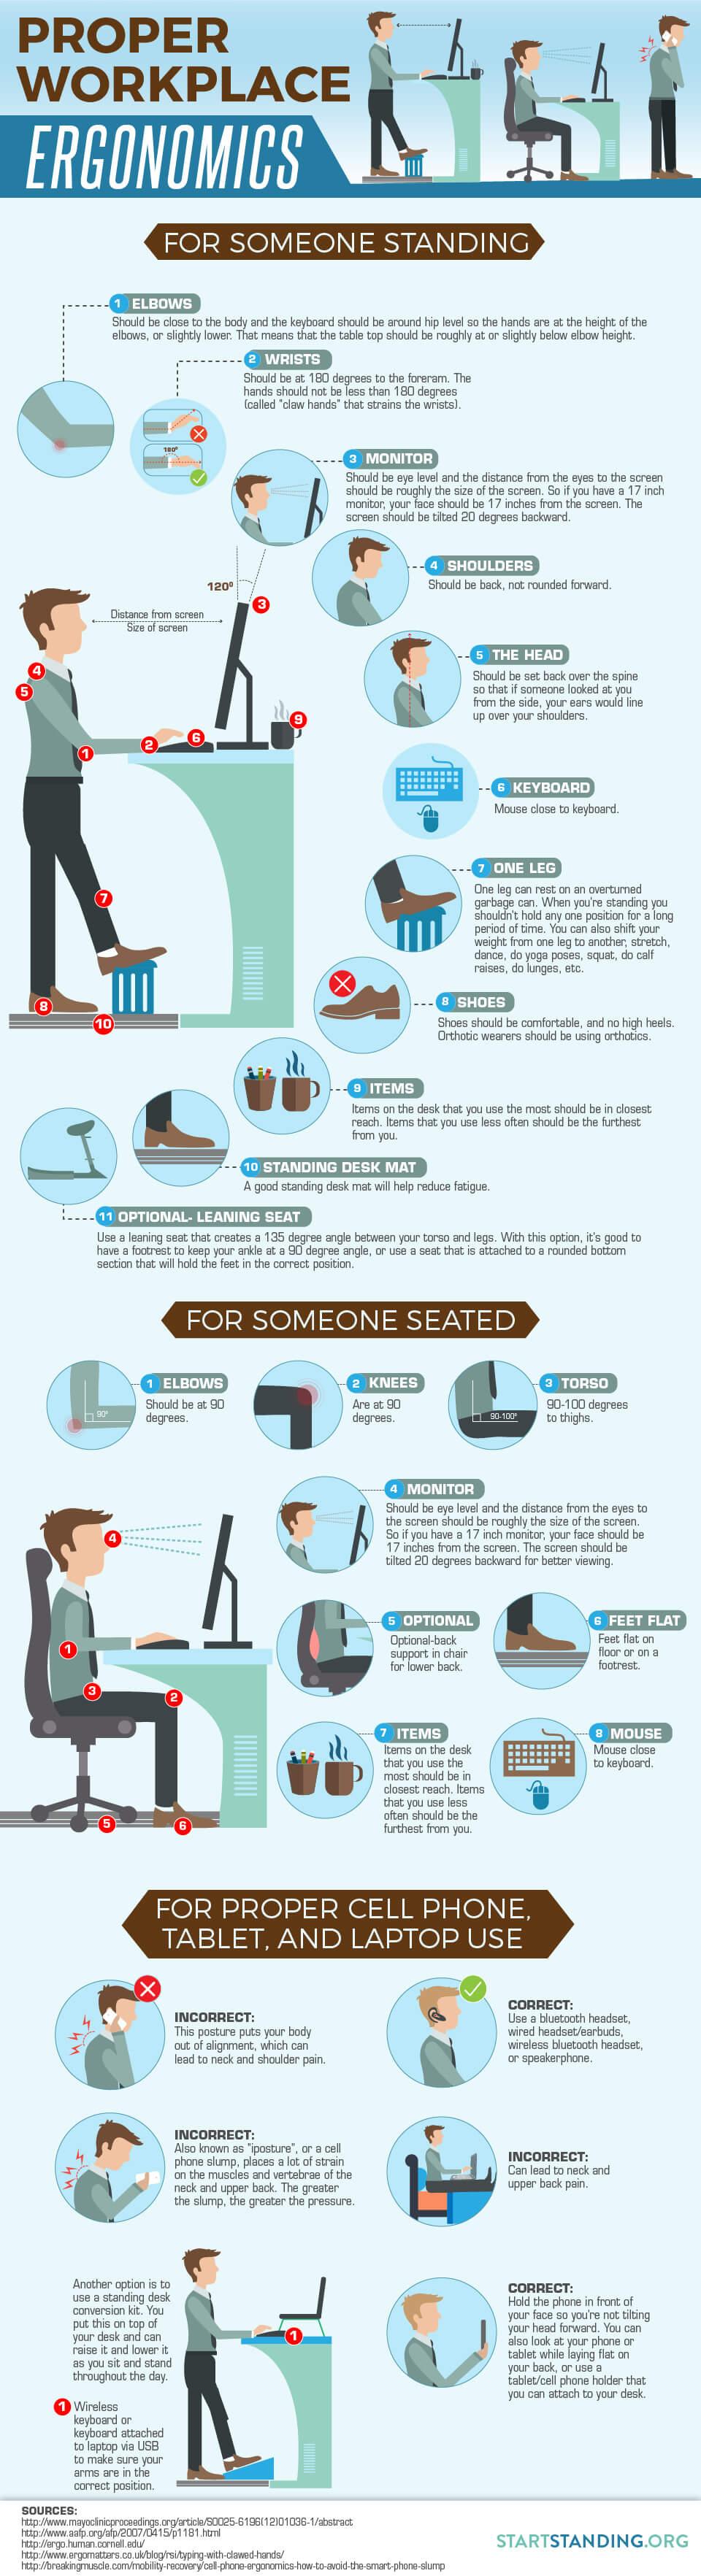 Standing Desk Ergonomics guide to proper sitting and standing desk ergonomics - start standing